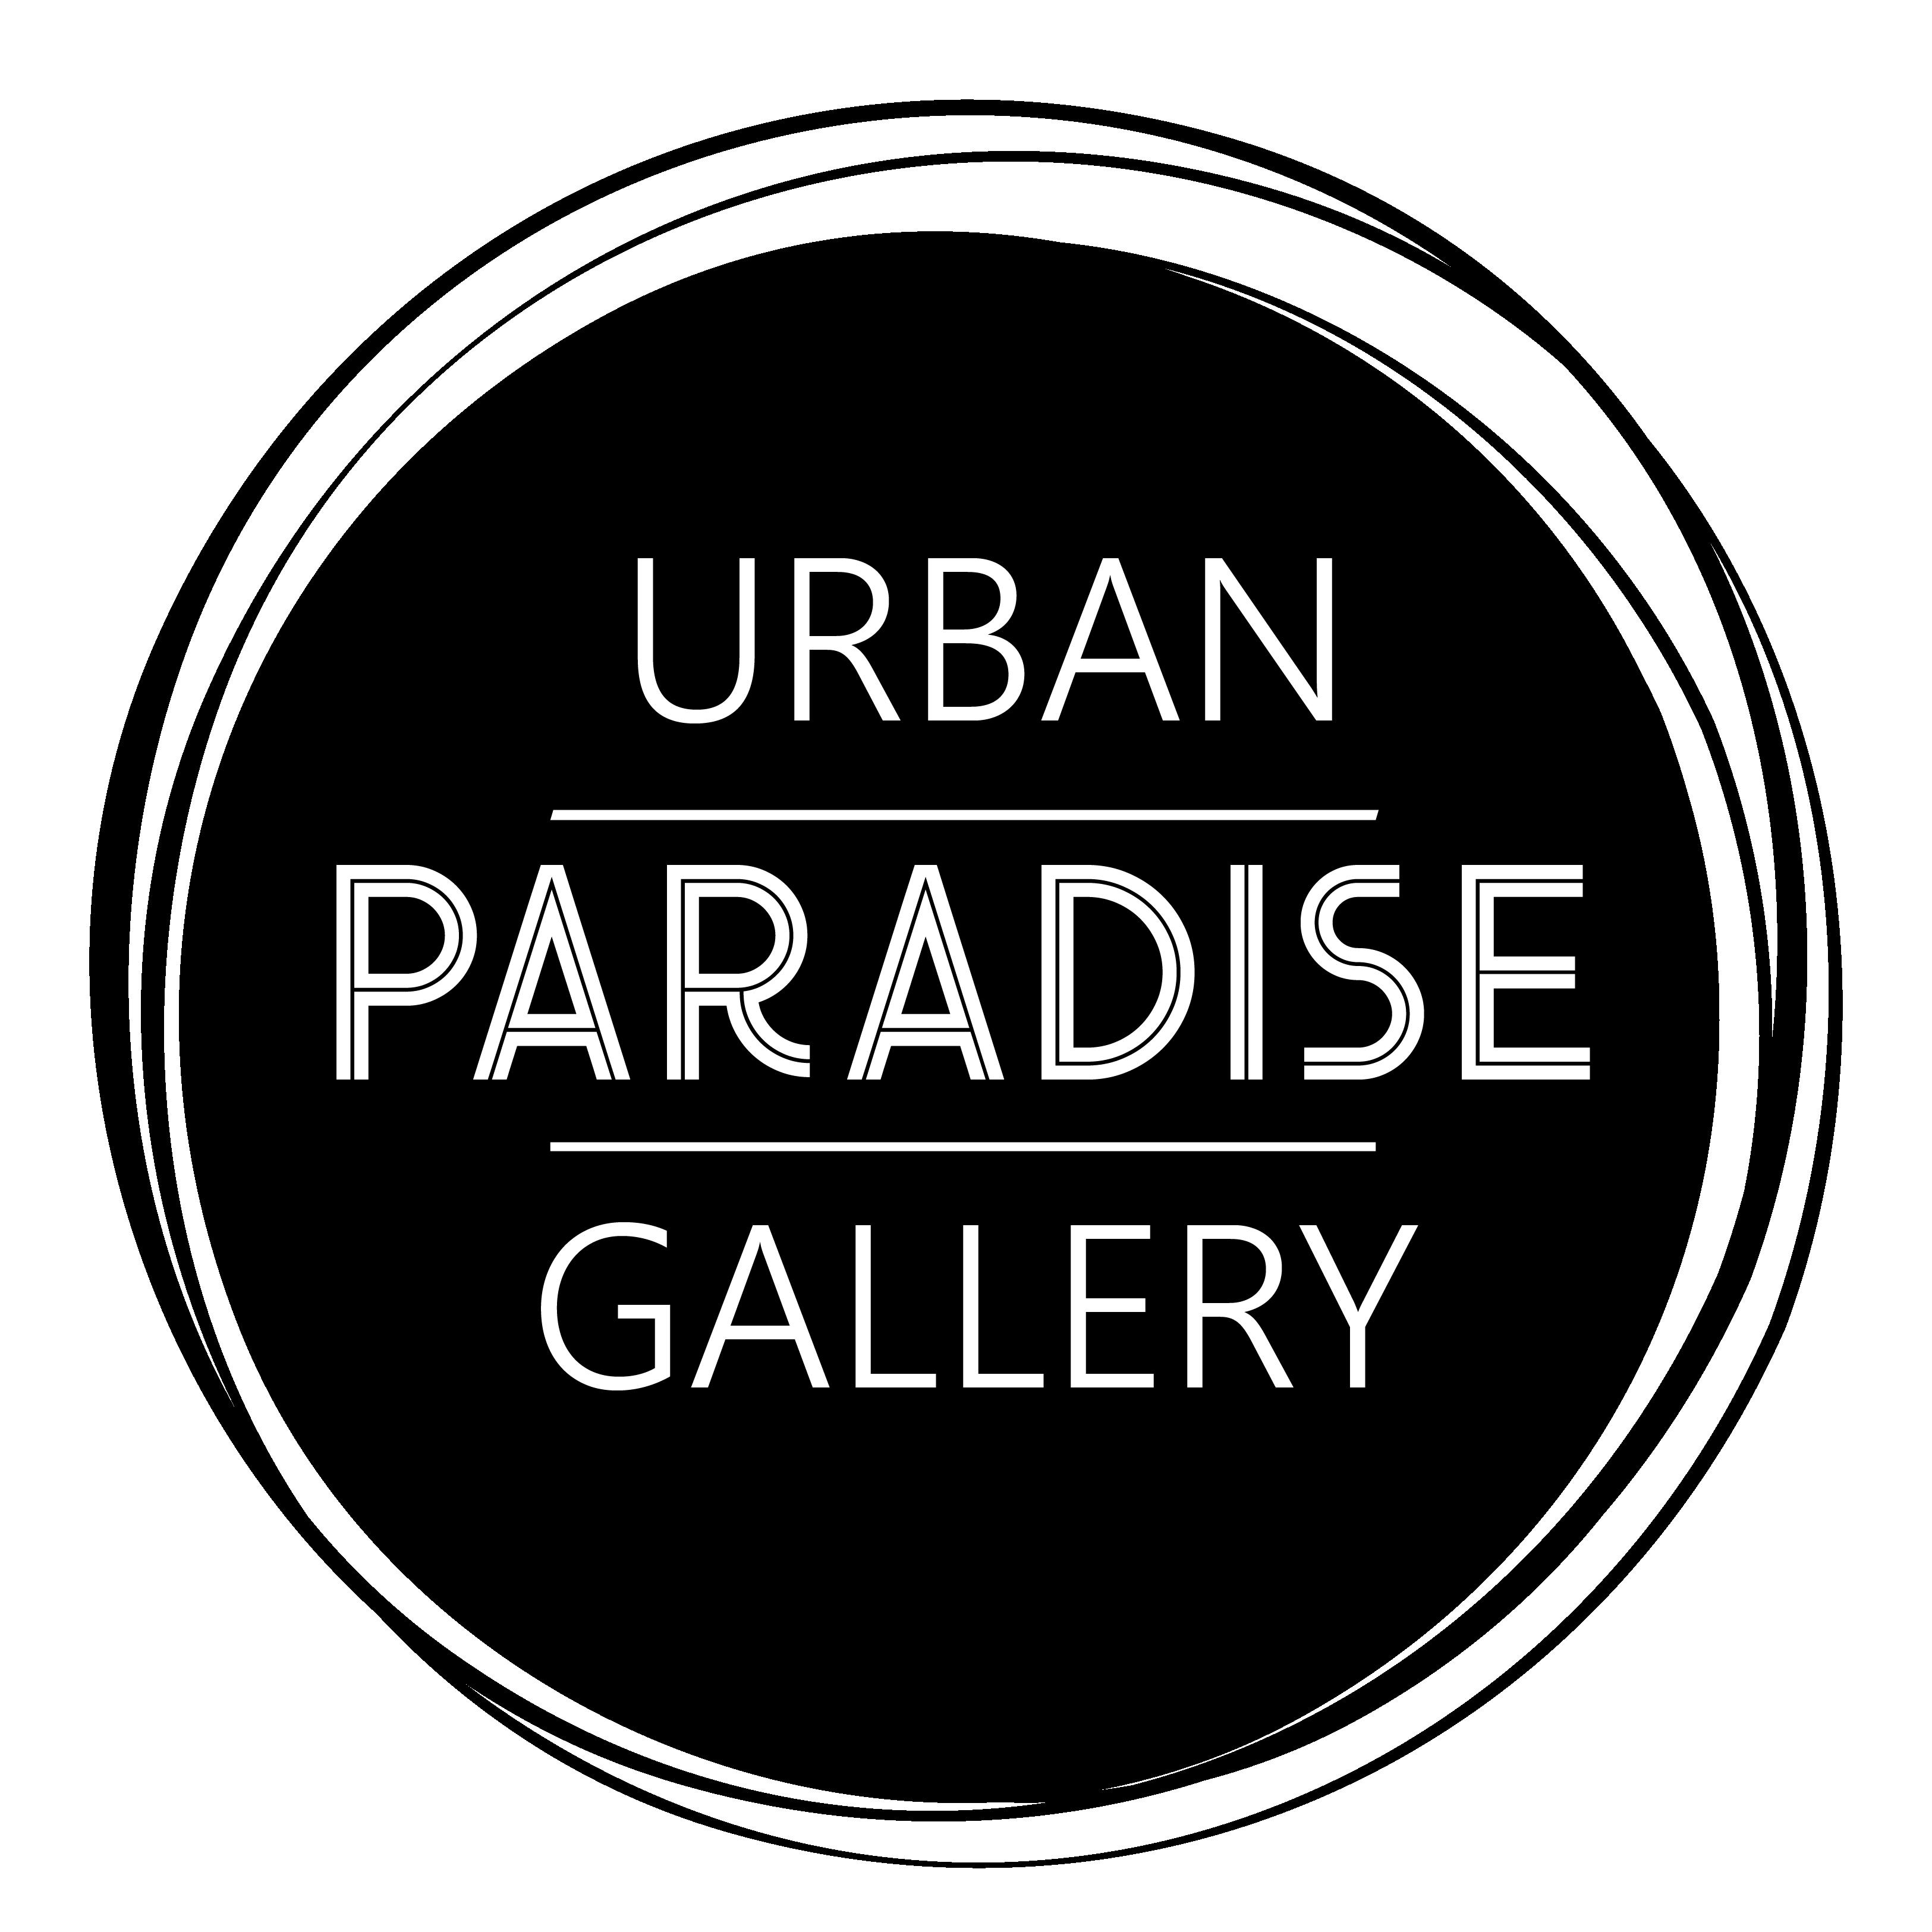 Urban Paradise Gallery